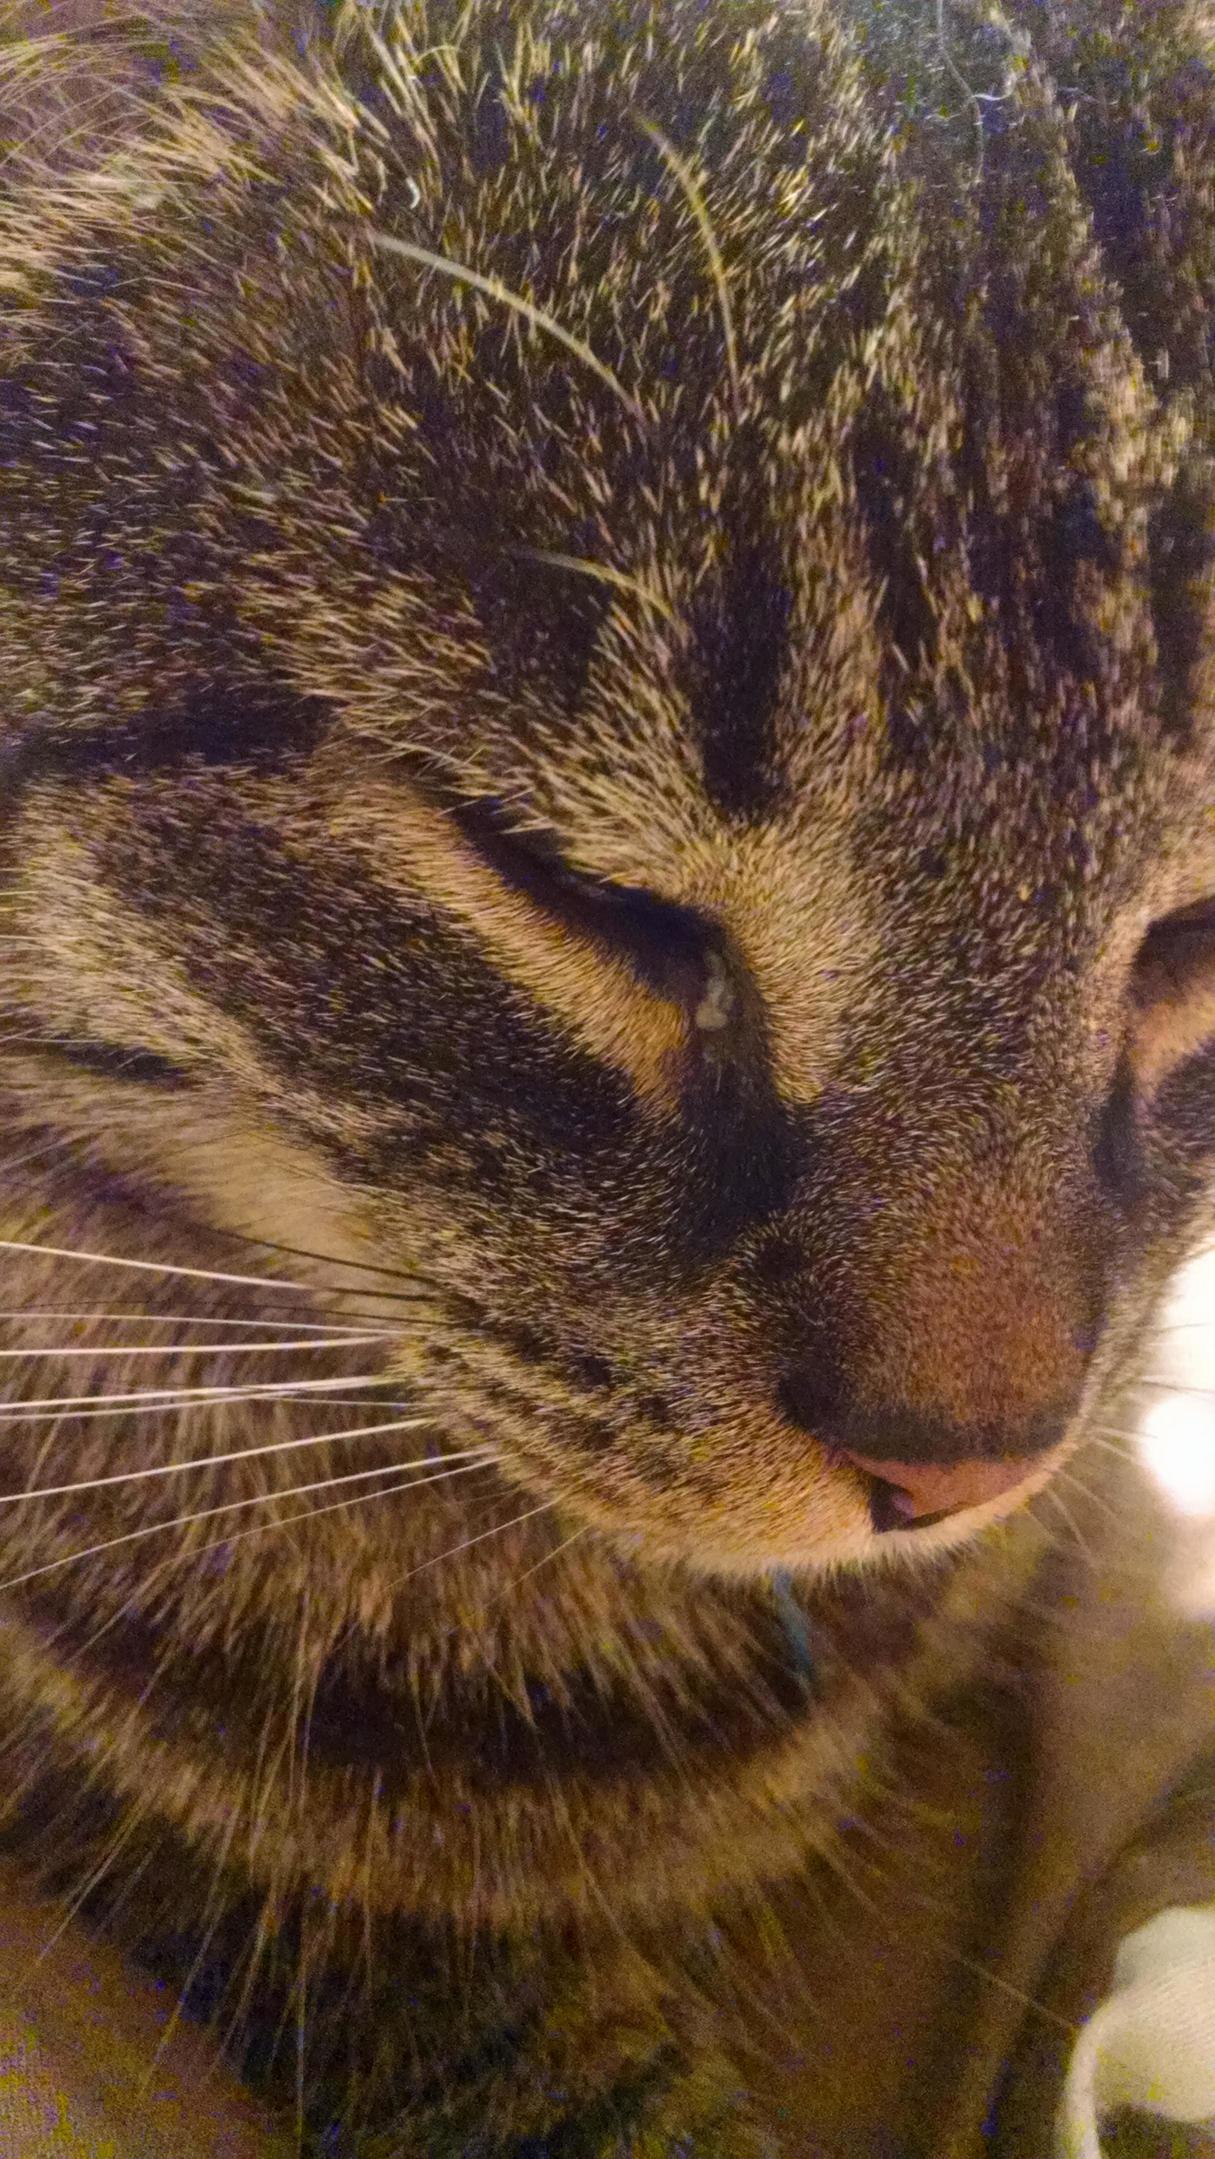 Does anybodys cat have seasonal allergies